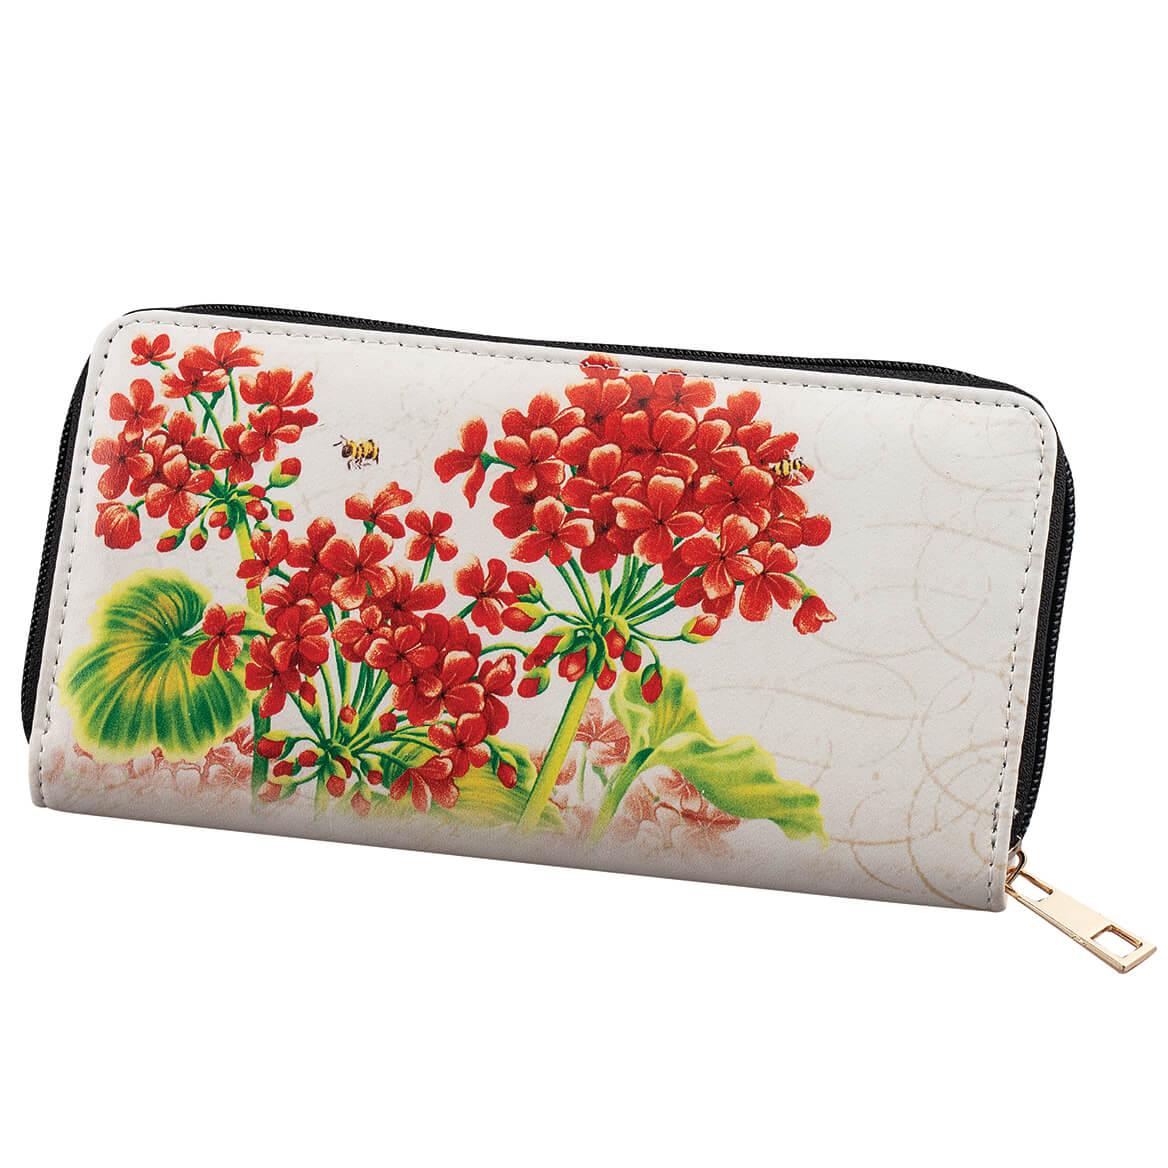 Designer Wallet Geraniums-369374